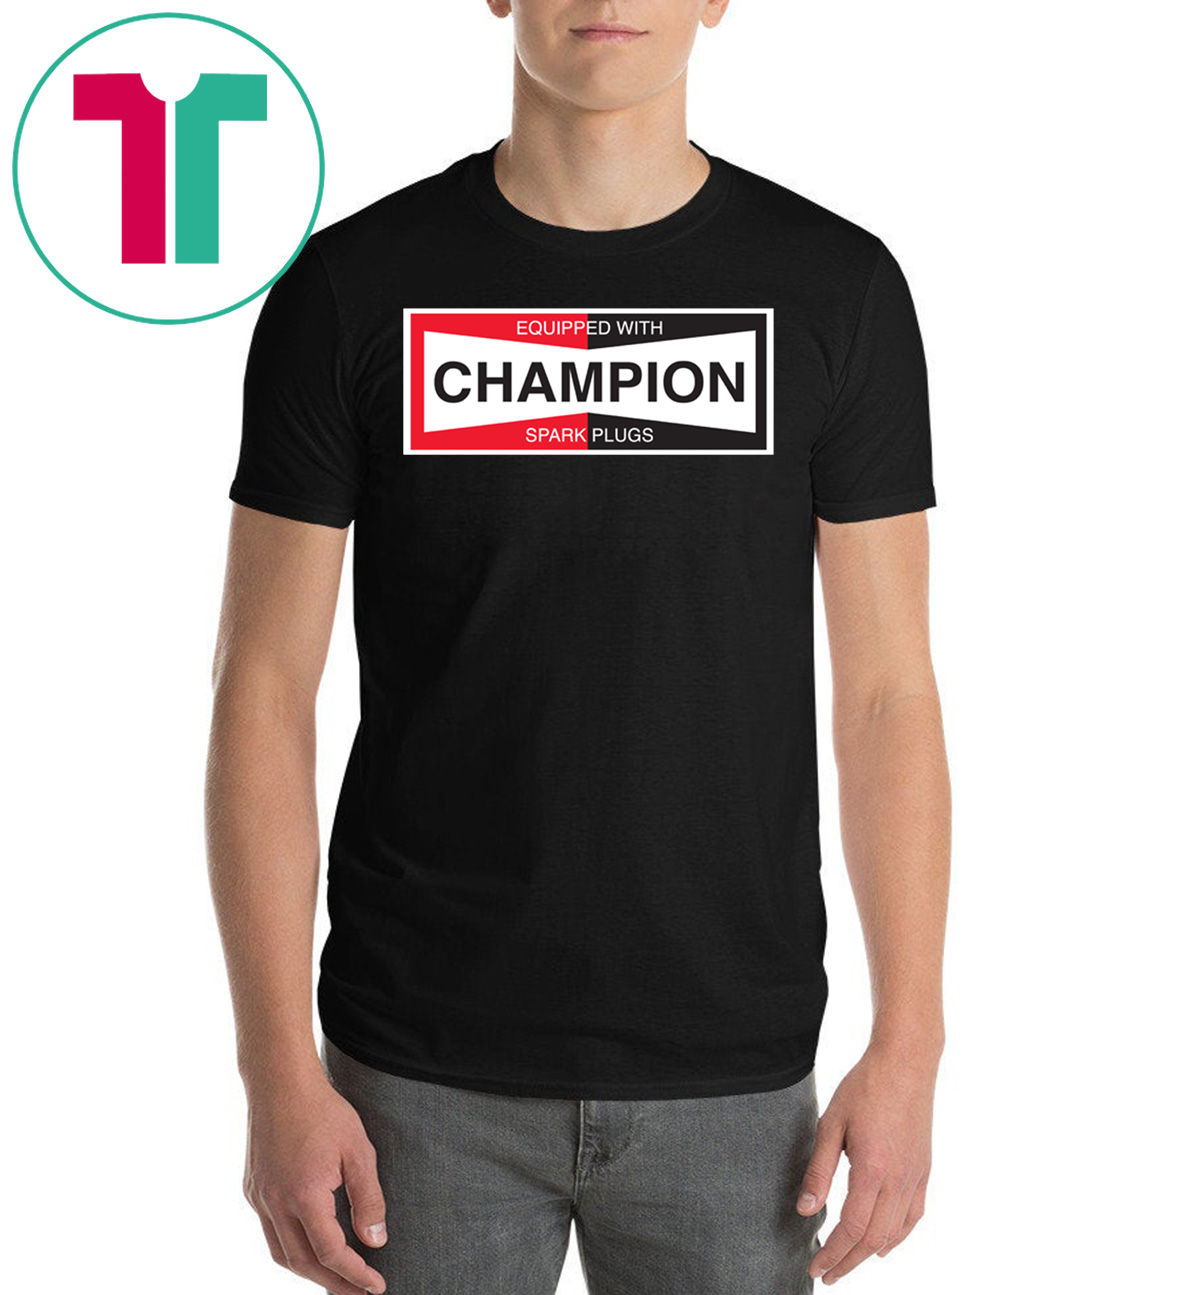 Champion Spark Plug Unisex Gift T-Shirt - OrderQuilt com